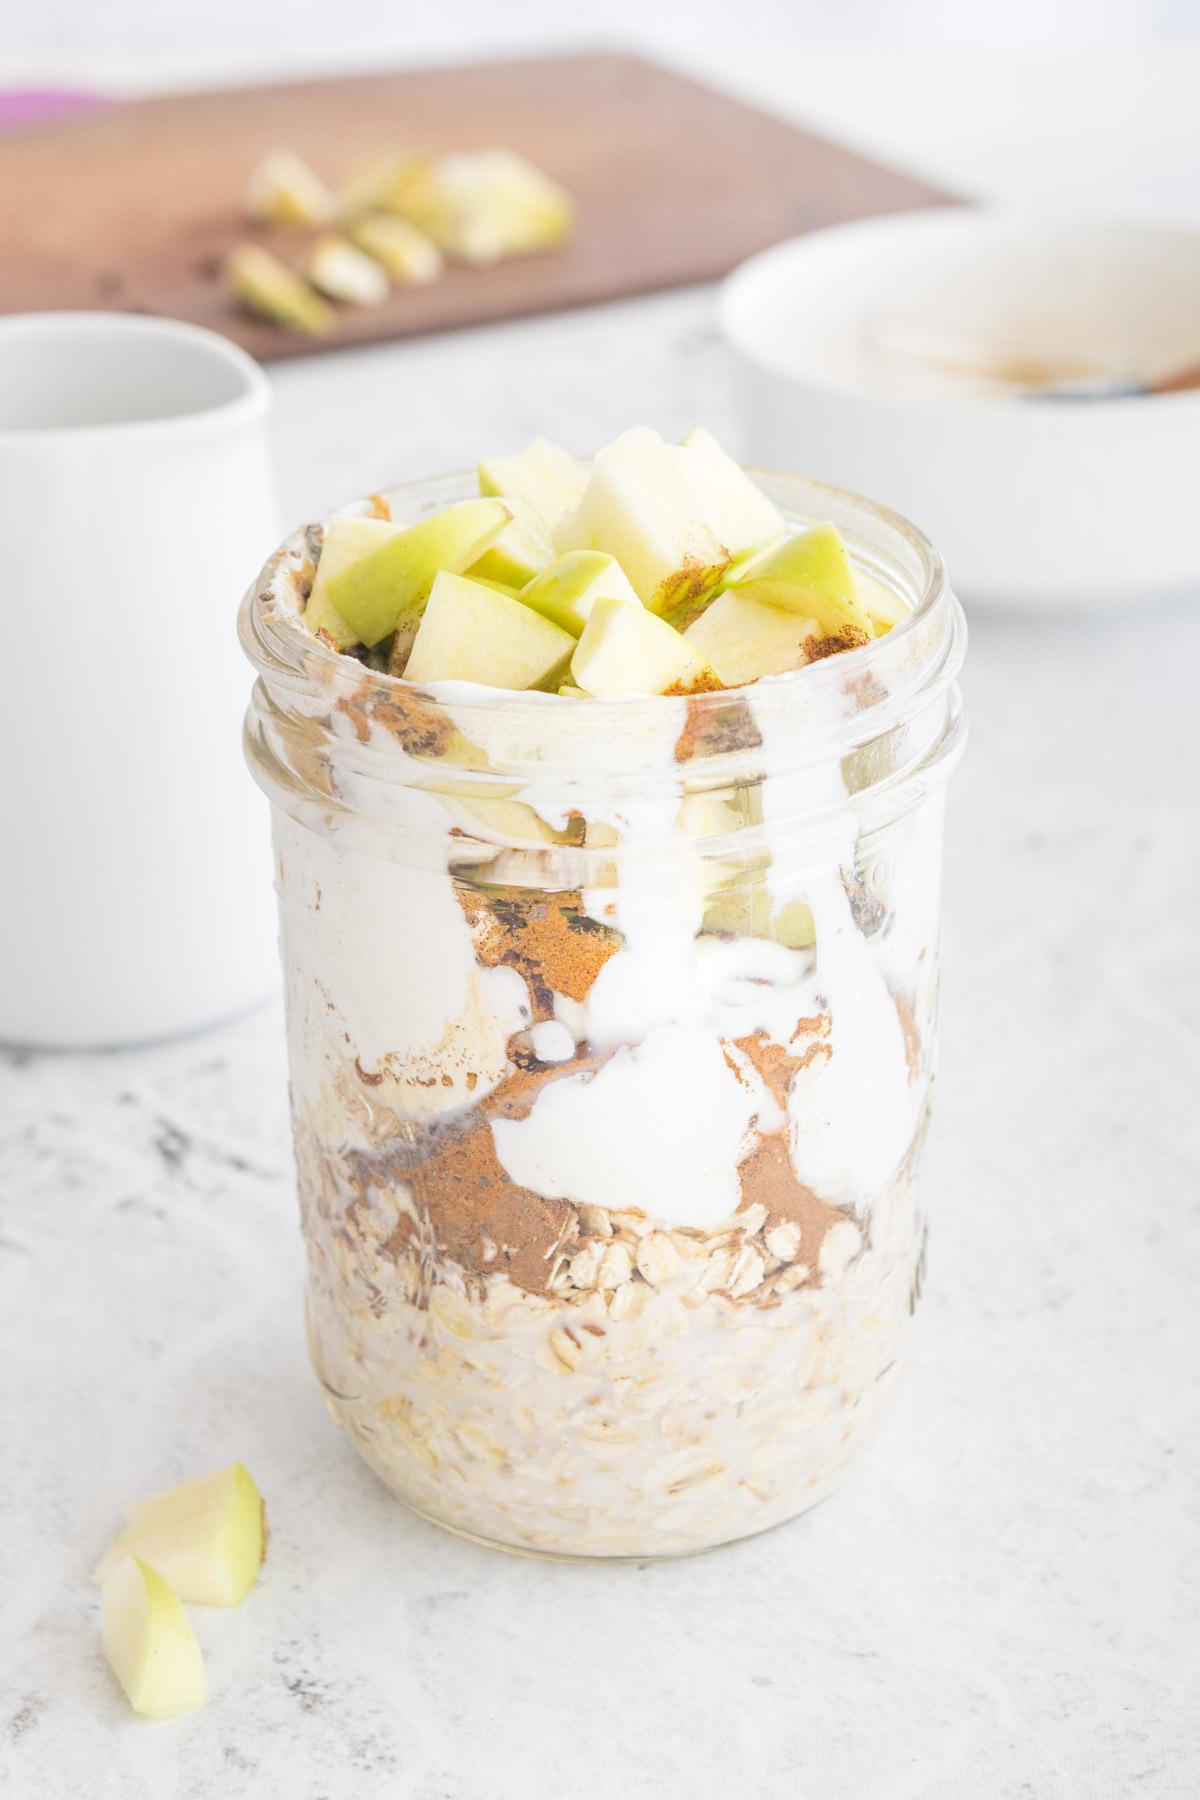 apple cinnamon overnight oats in a glass jar